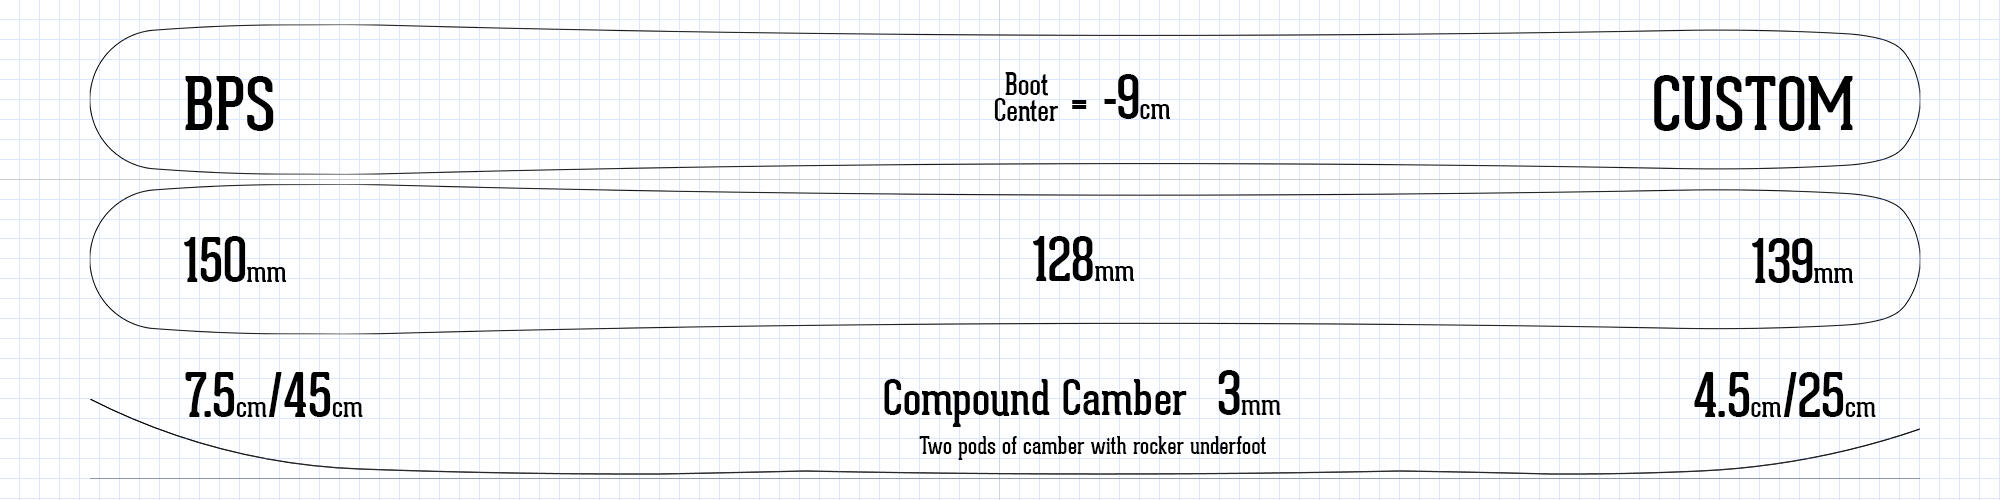 BPS ski information rocker camber profile specs